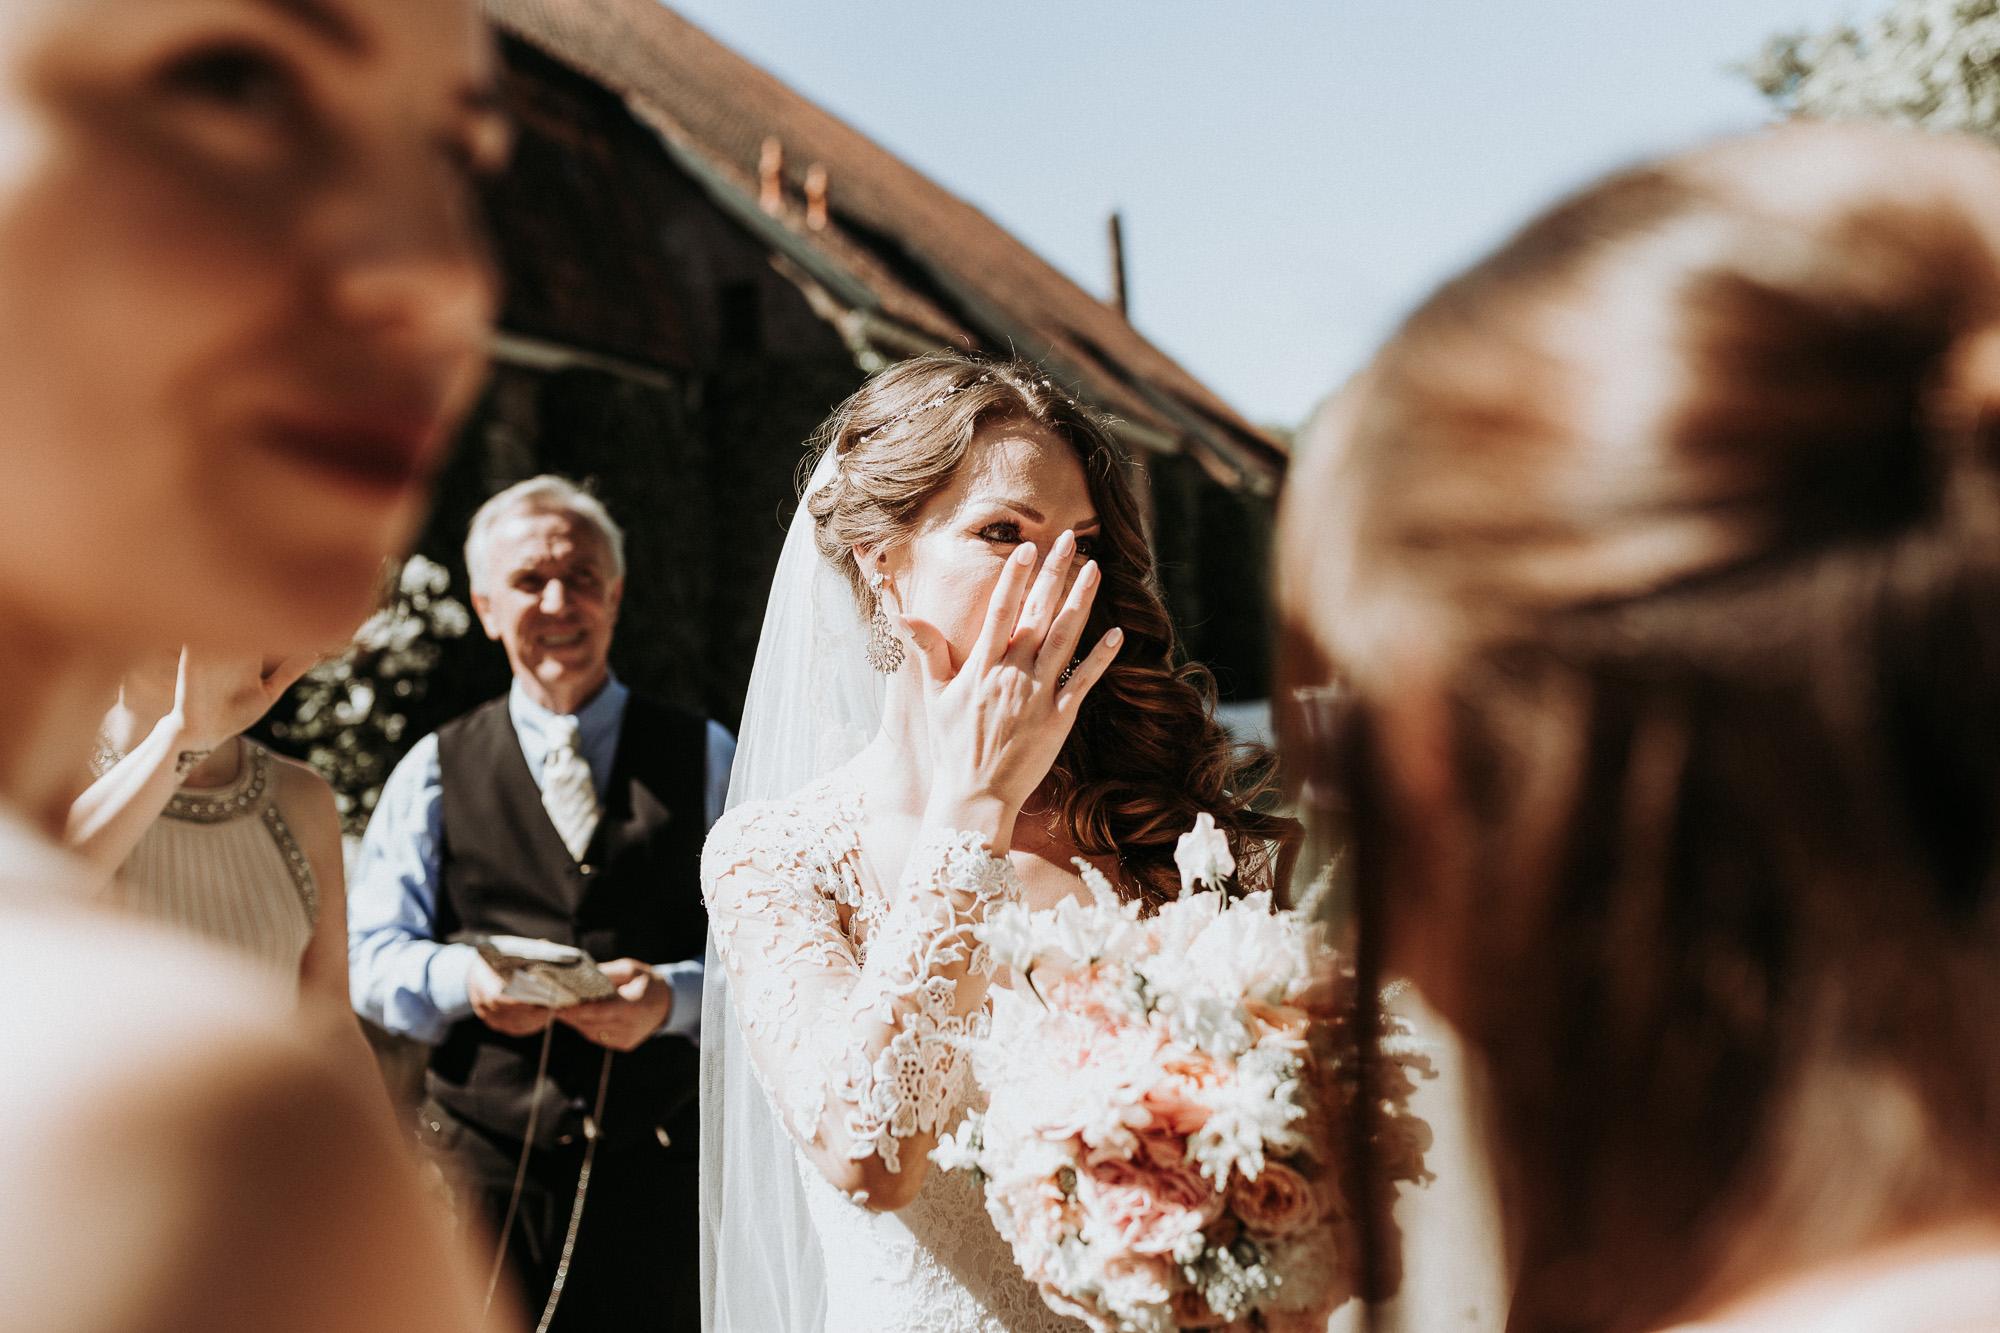 DanielaMarquardtPhotography_Hochzeitsfotograf_Düsseldorf_Köln_Mallorca_Bayern_Austria_Harz_Wedding_AileenundLennart_Weddingphotographer_Ibiza_Tuskany_Italien_Toskana_Portugal_Lissabon98